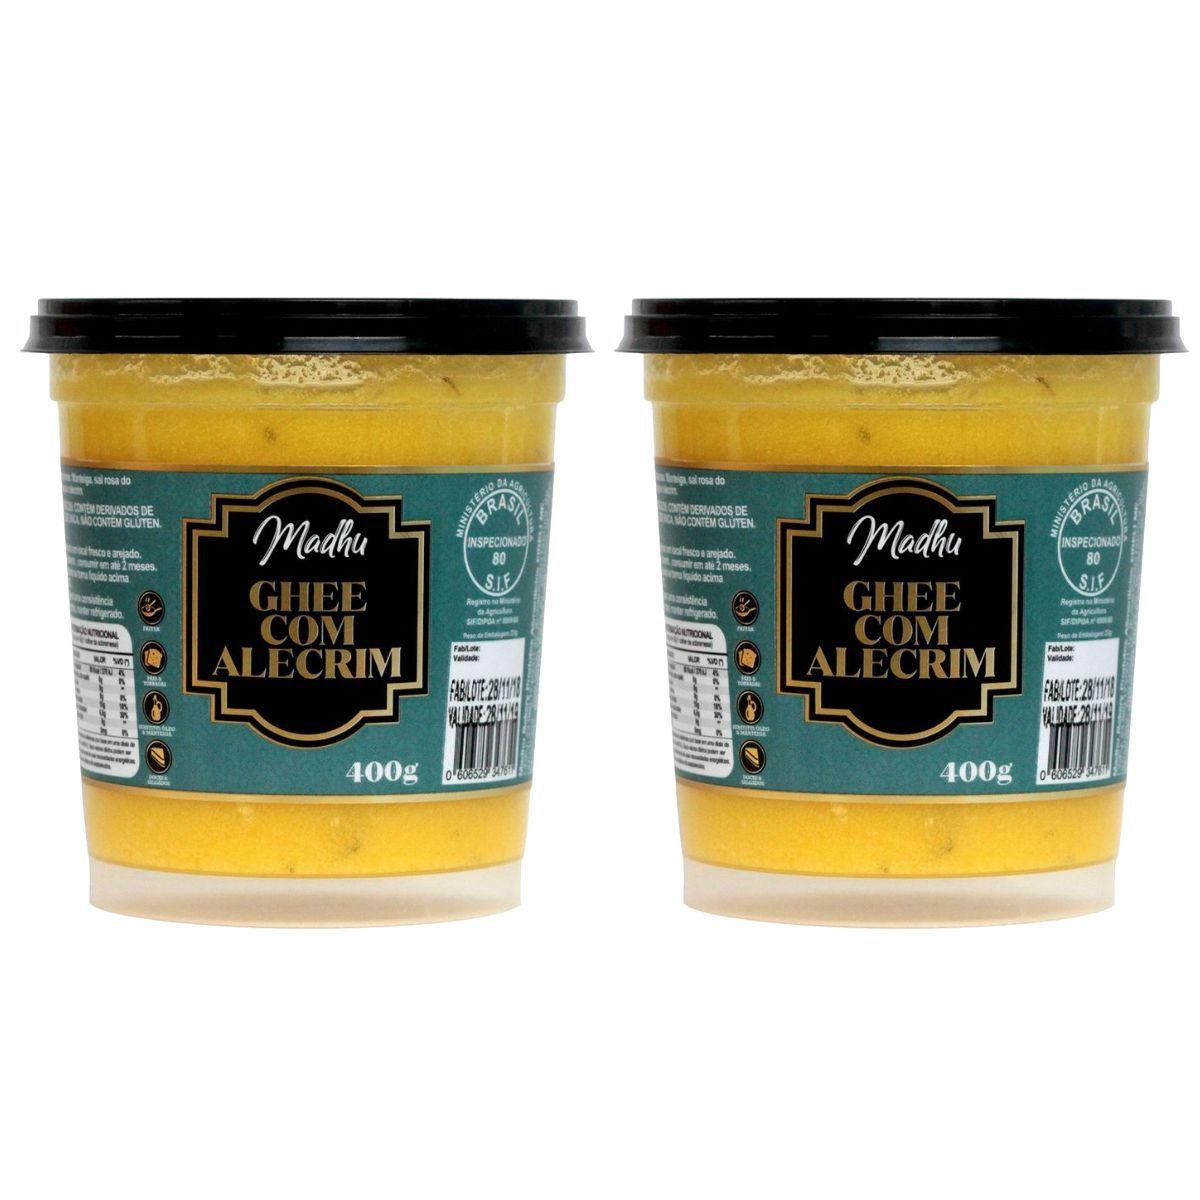 Kit 2 Manteigas Ghee 400g Clarificada C/ Alecrim Zero Lactose - Madhu